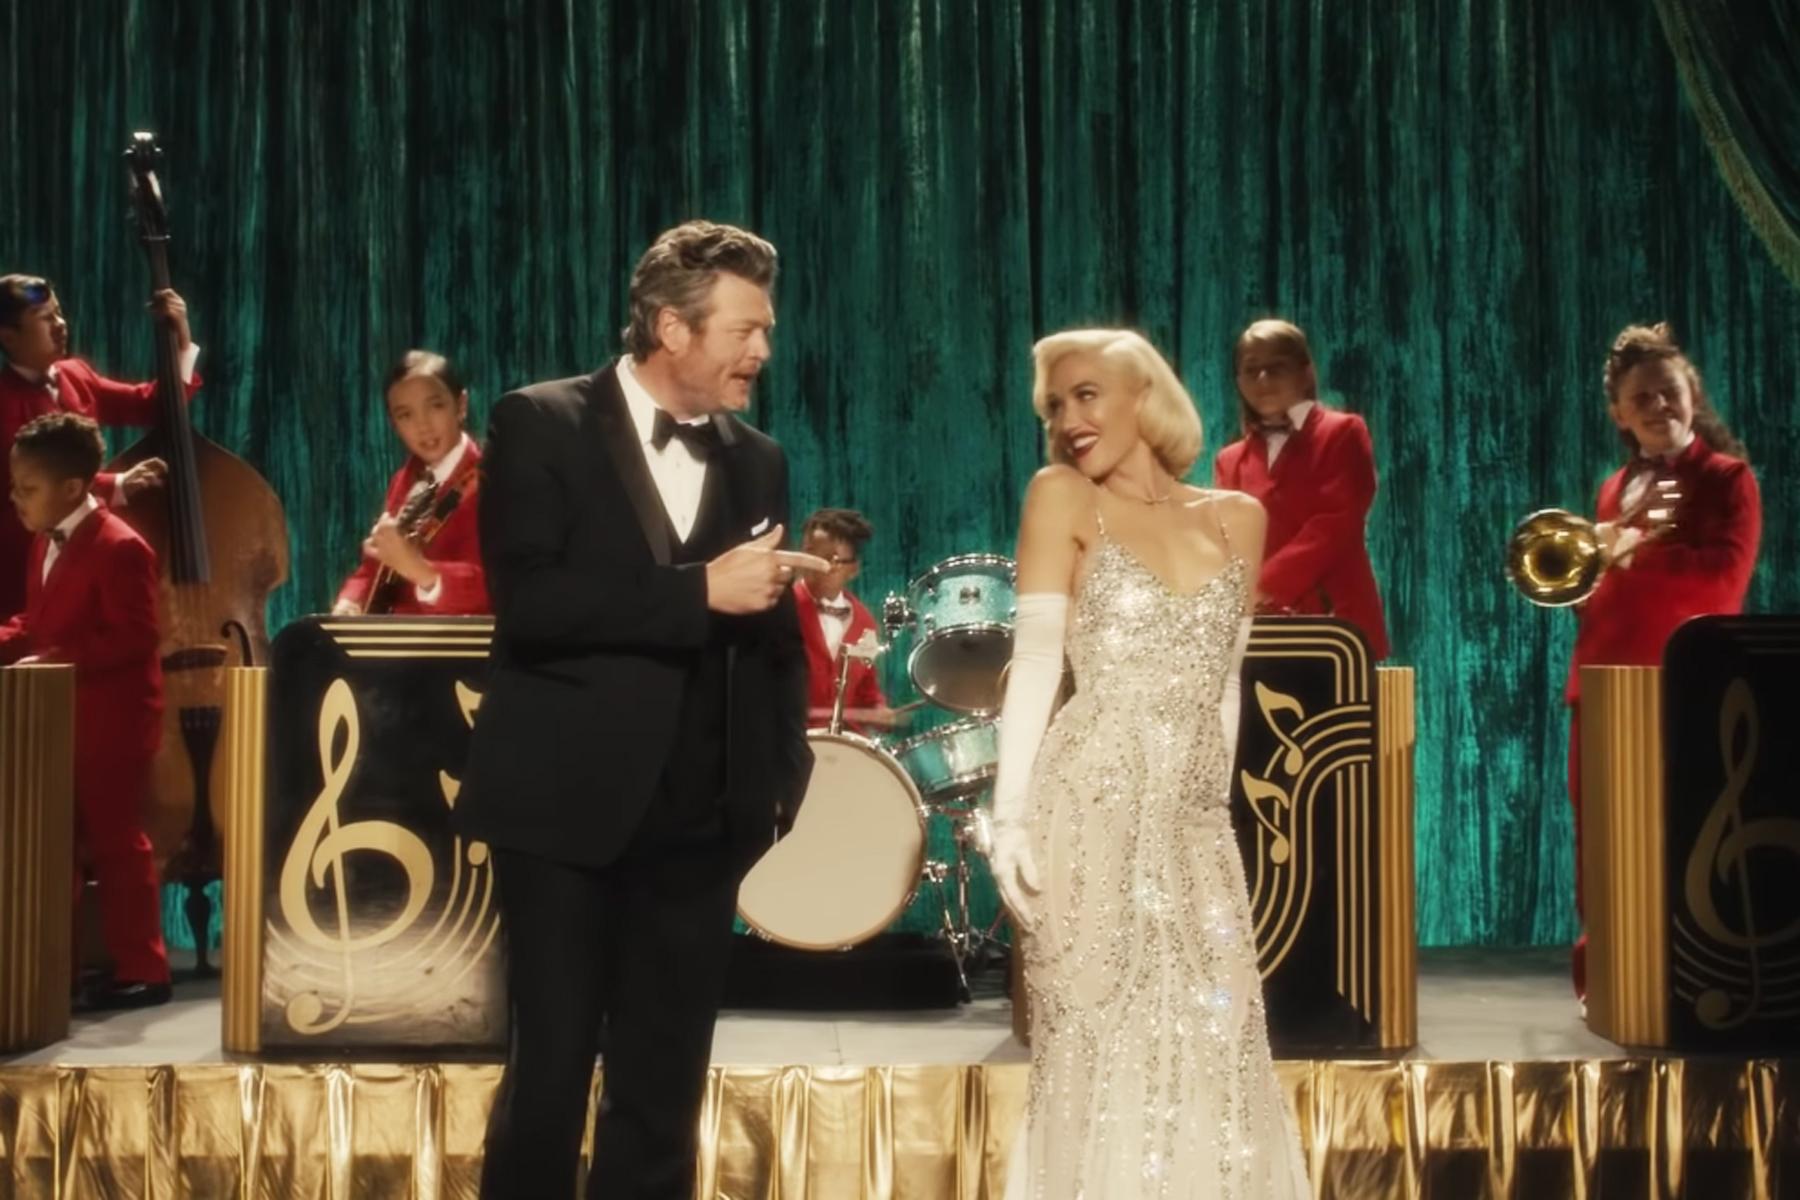 Blake Shelton Gwen Stefani Christmas Special 2020 Gwen Stefani, Blake Shelton: 'You Make It Feel Like Christmas